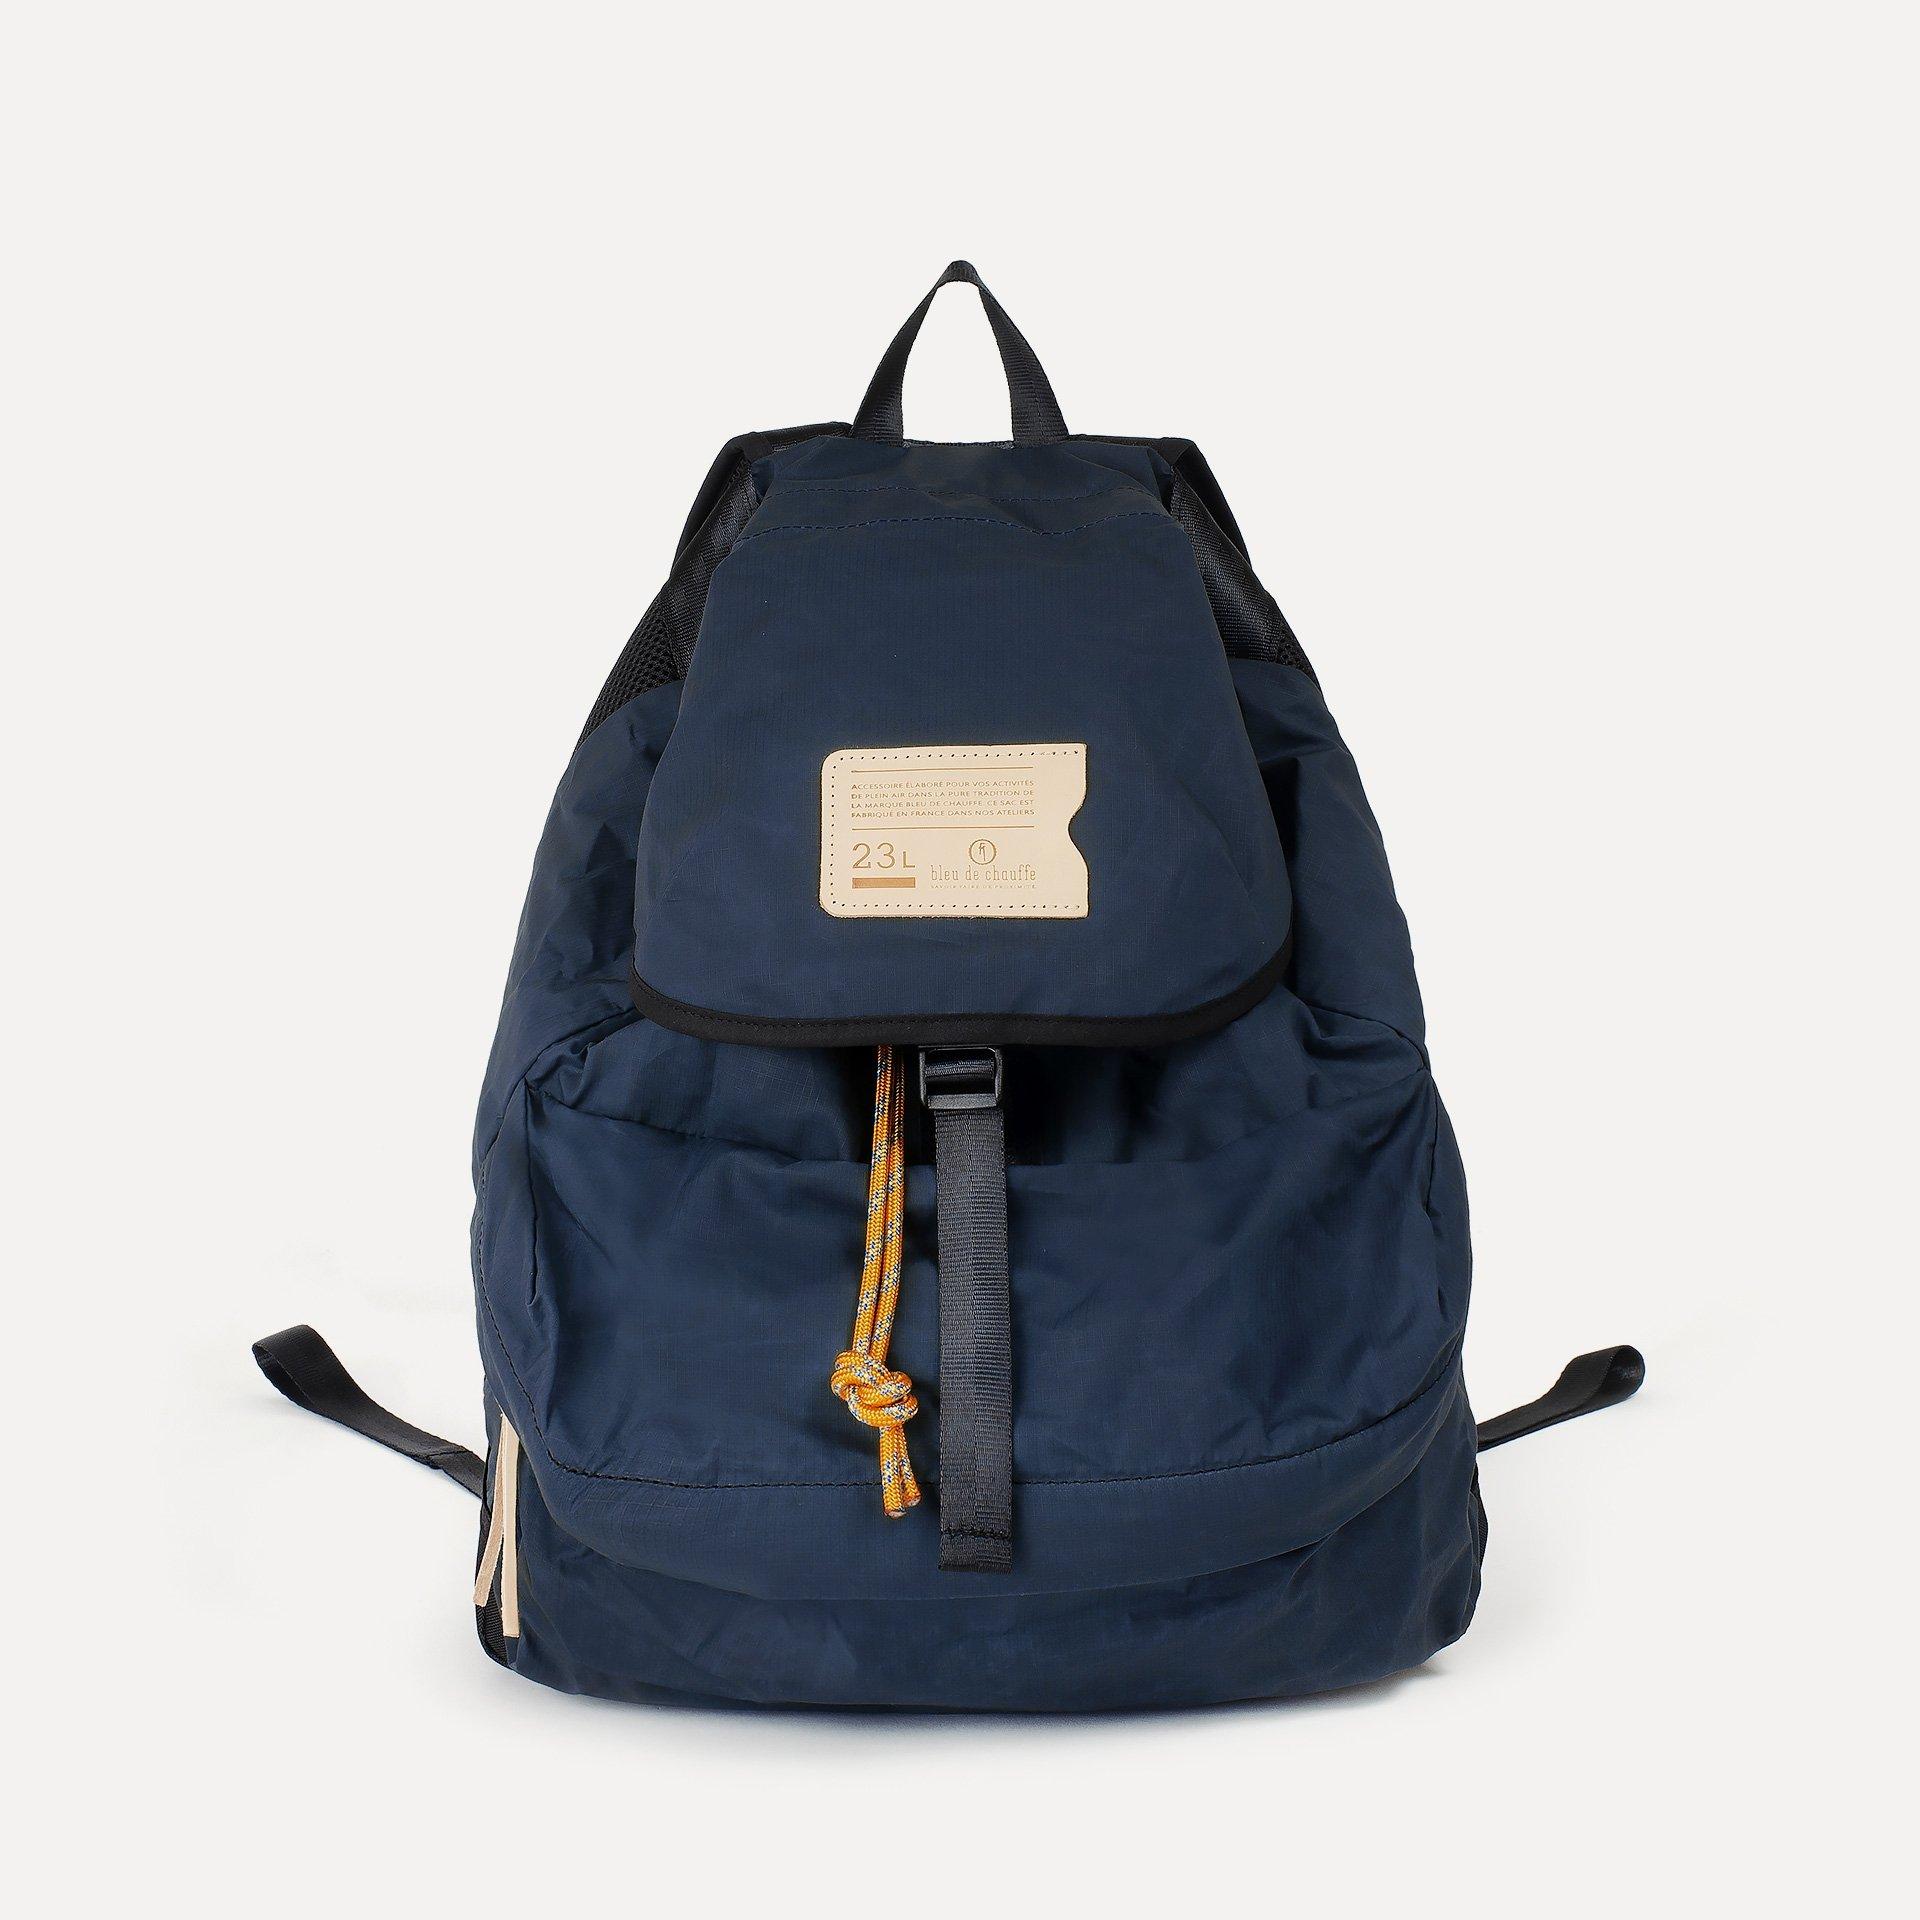 23L Bayou Backpack - Hague Blue (image n°1)